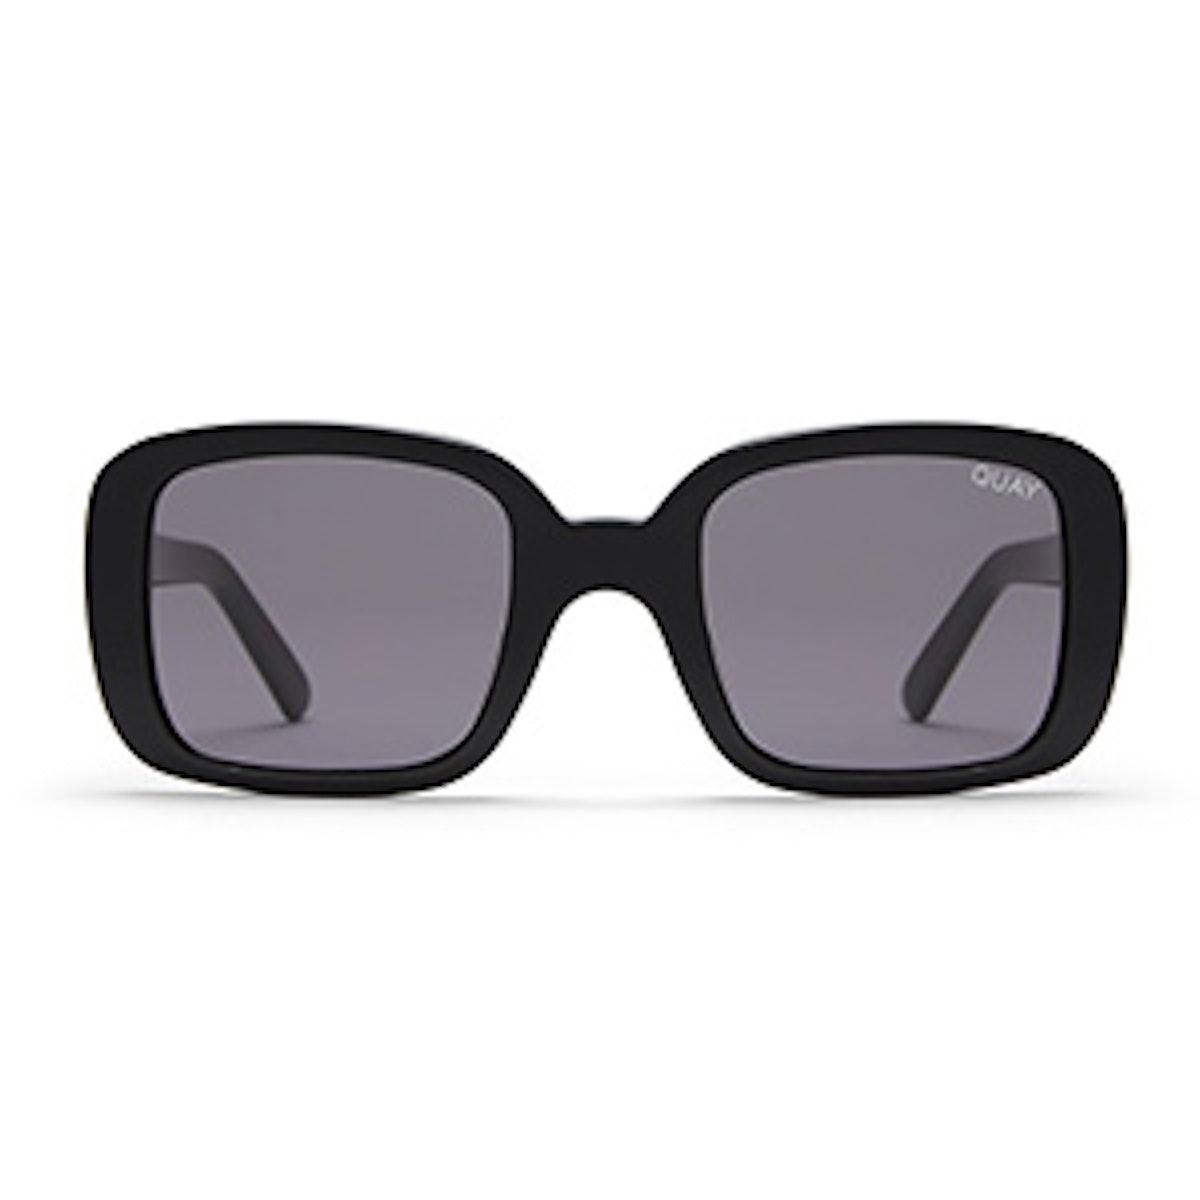 20s Sunglasses